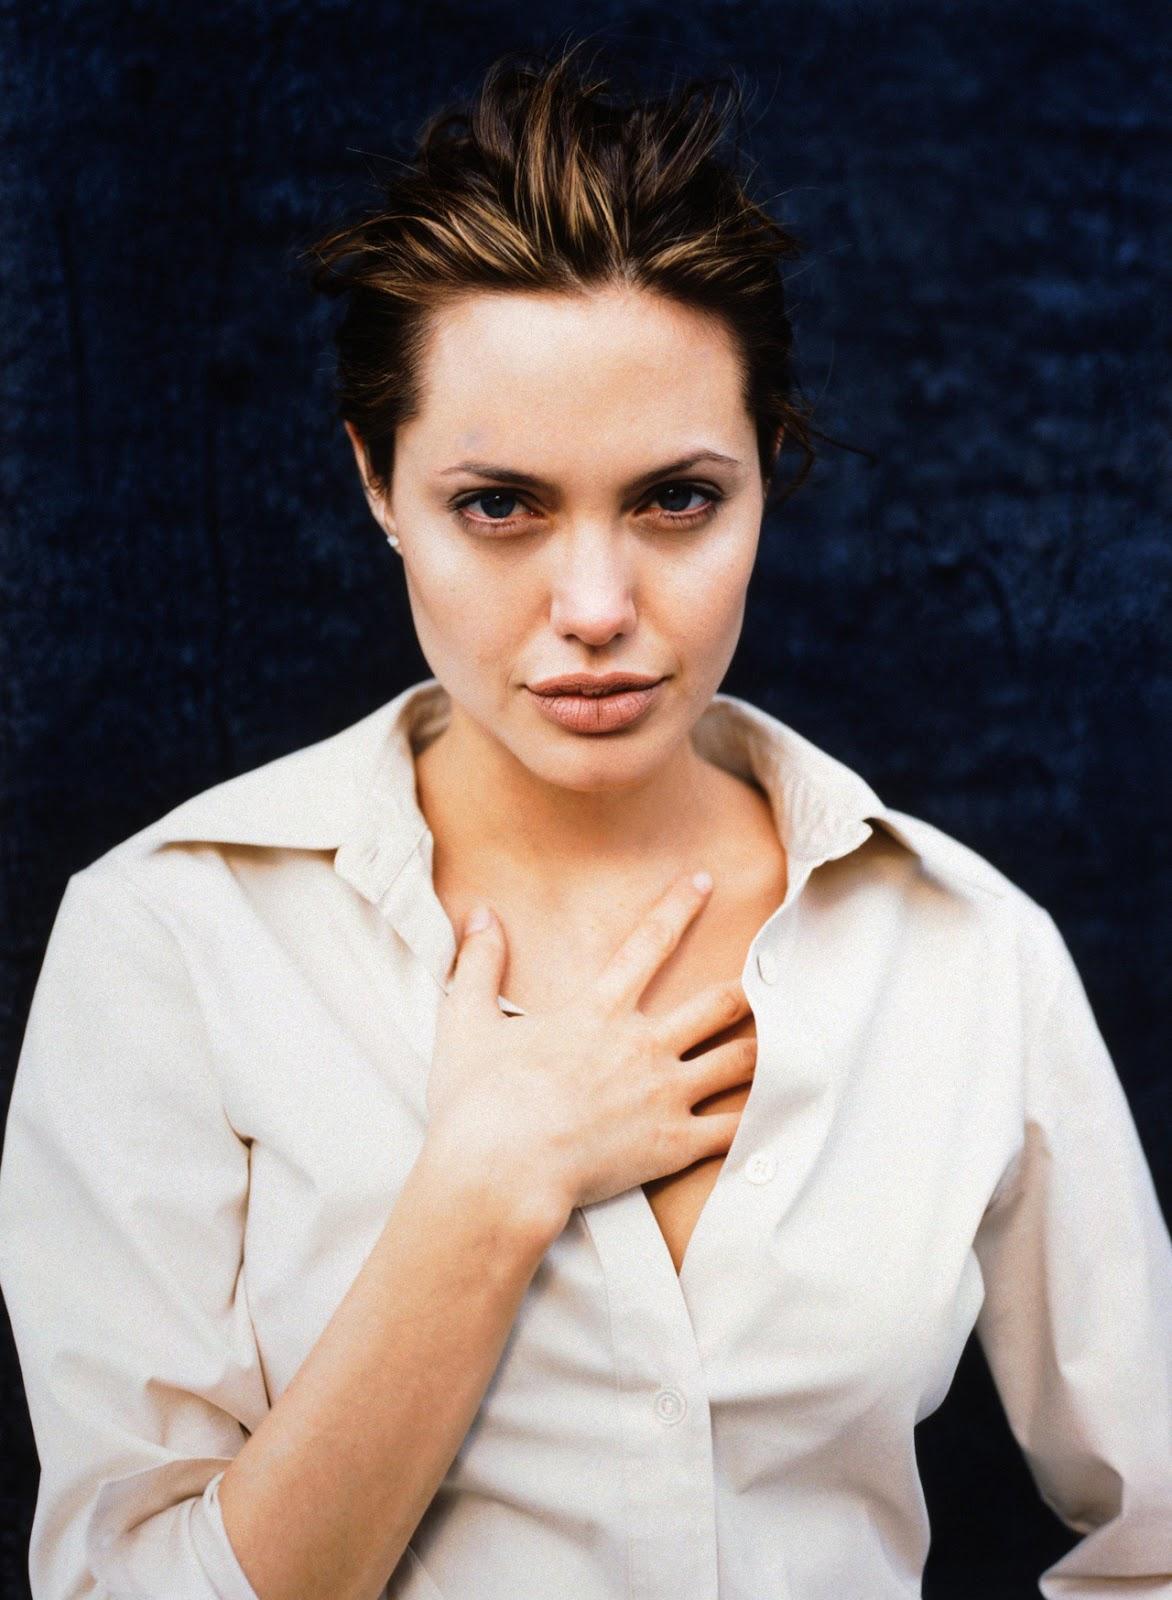 Angelina Jolie Look Using All Drugstore Makeup: Angelina Jolie Summary